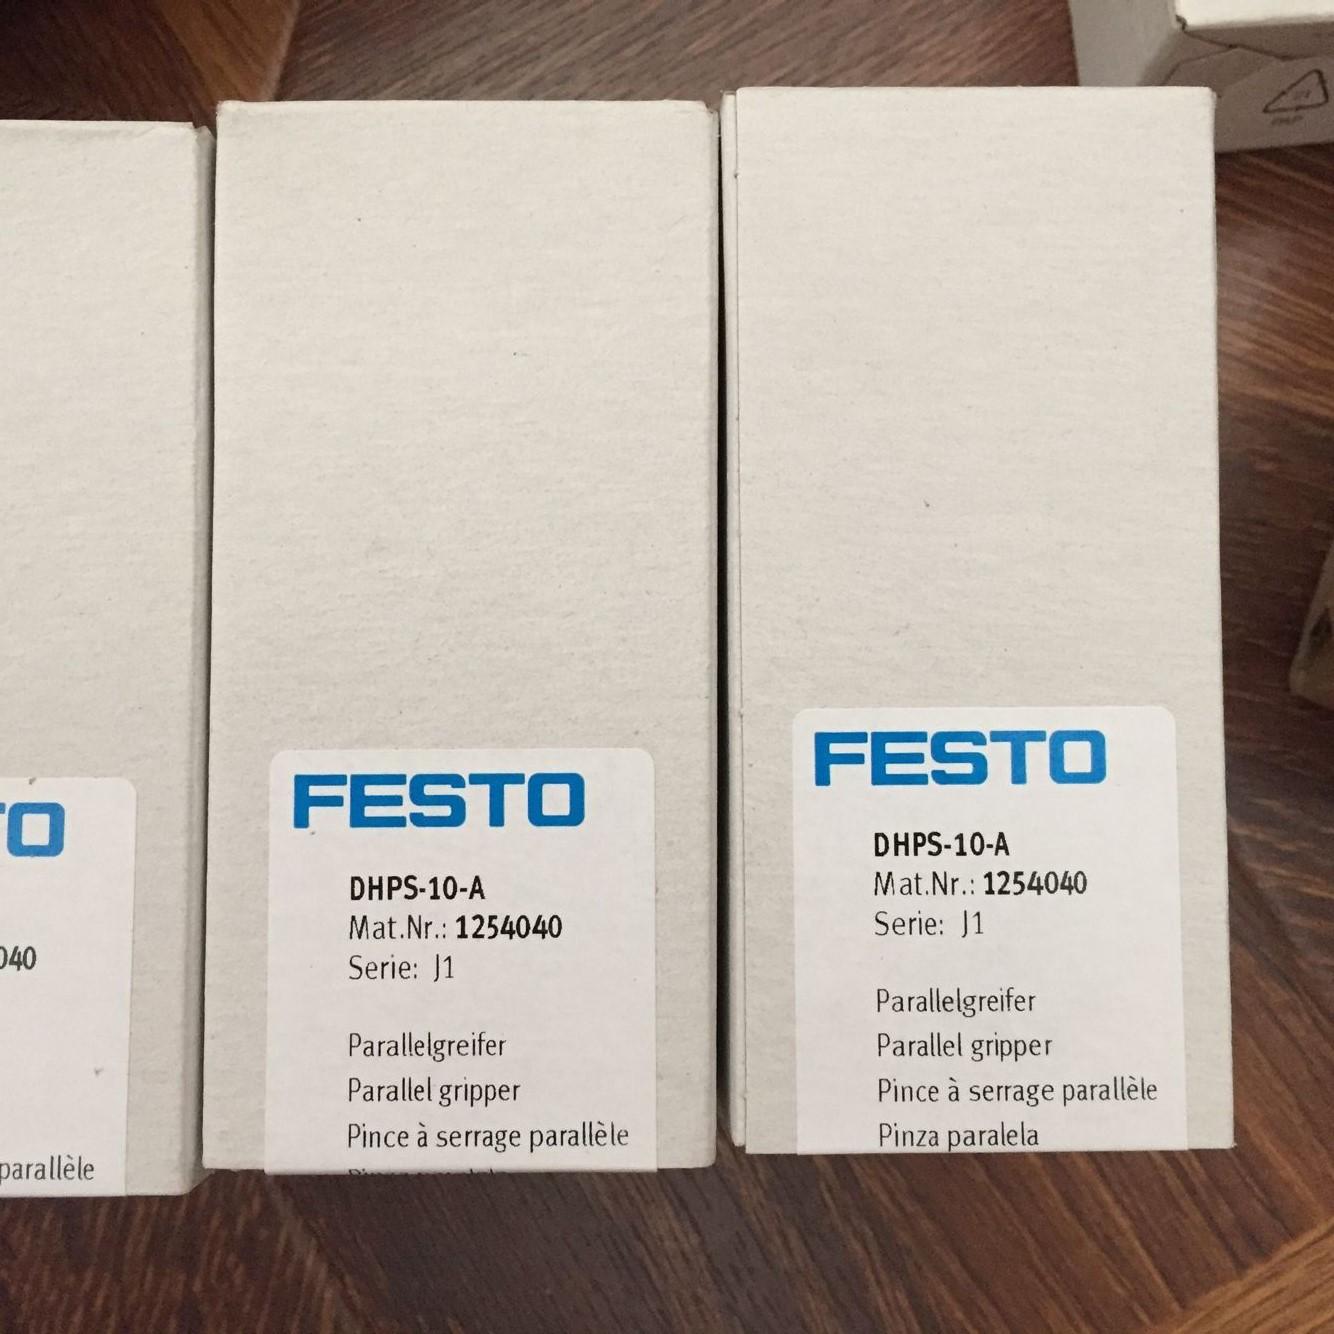 FESTO DHPS-10-A 1254040